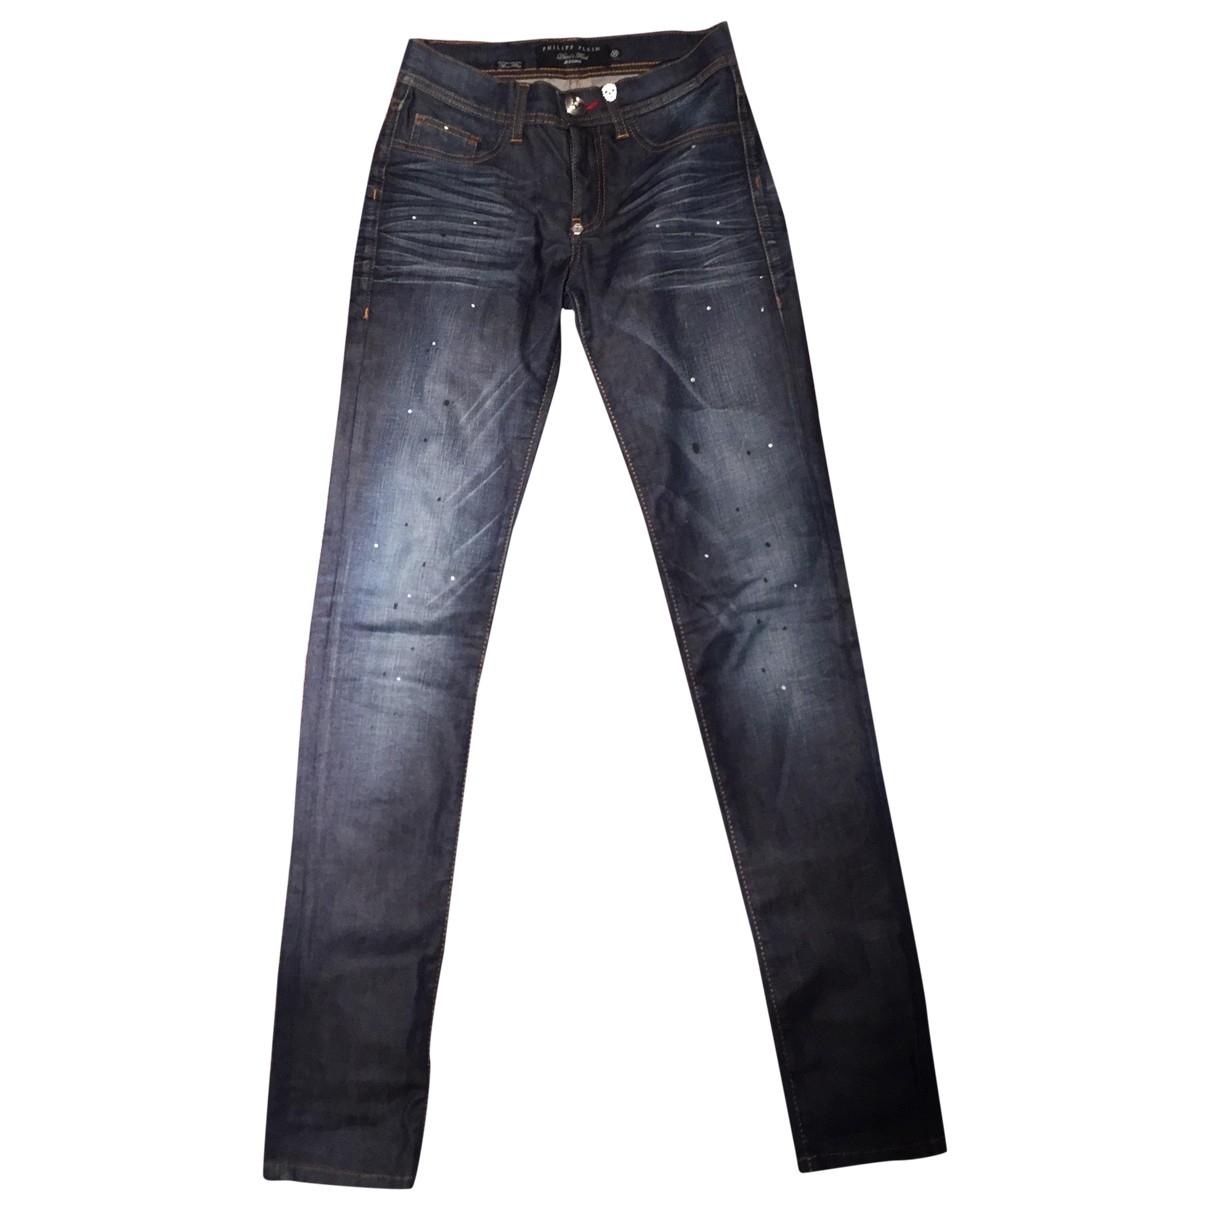 Philipp Plein \N Blue Cotton - elasthane Jeans for Women 25 US